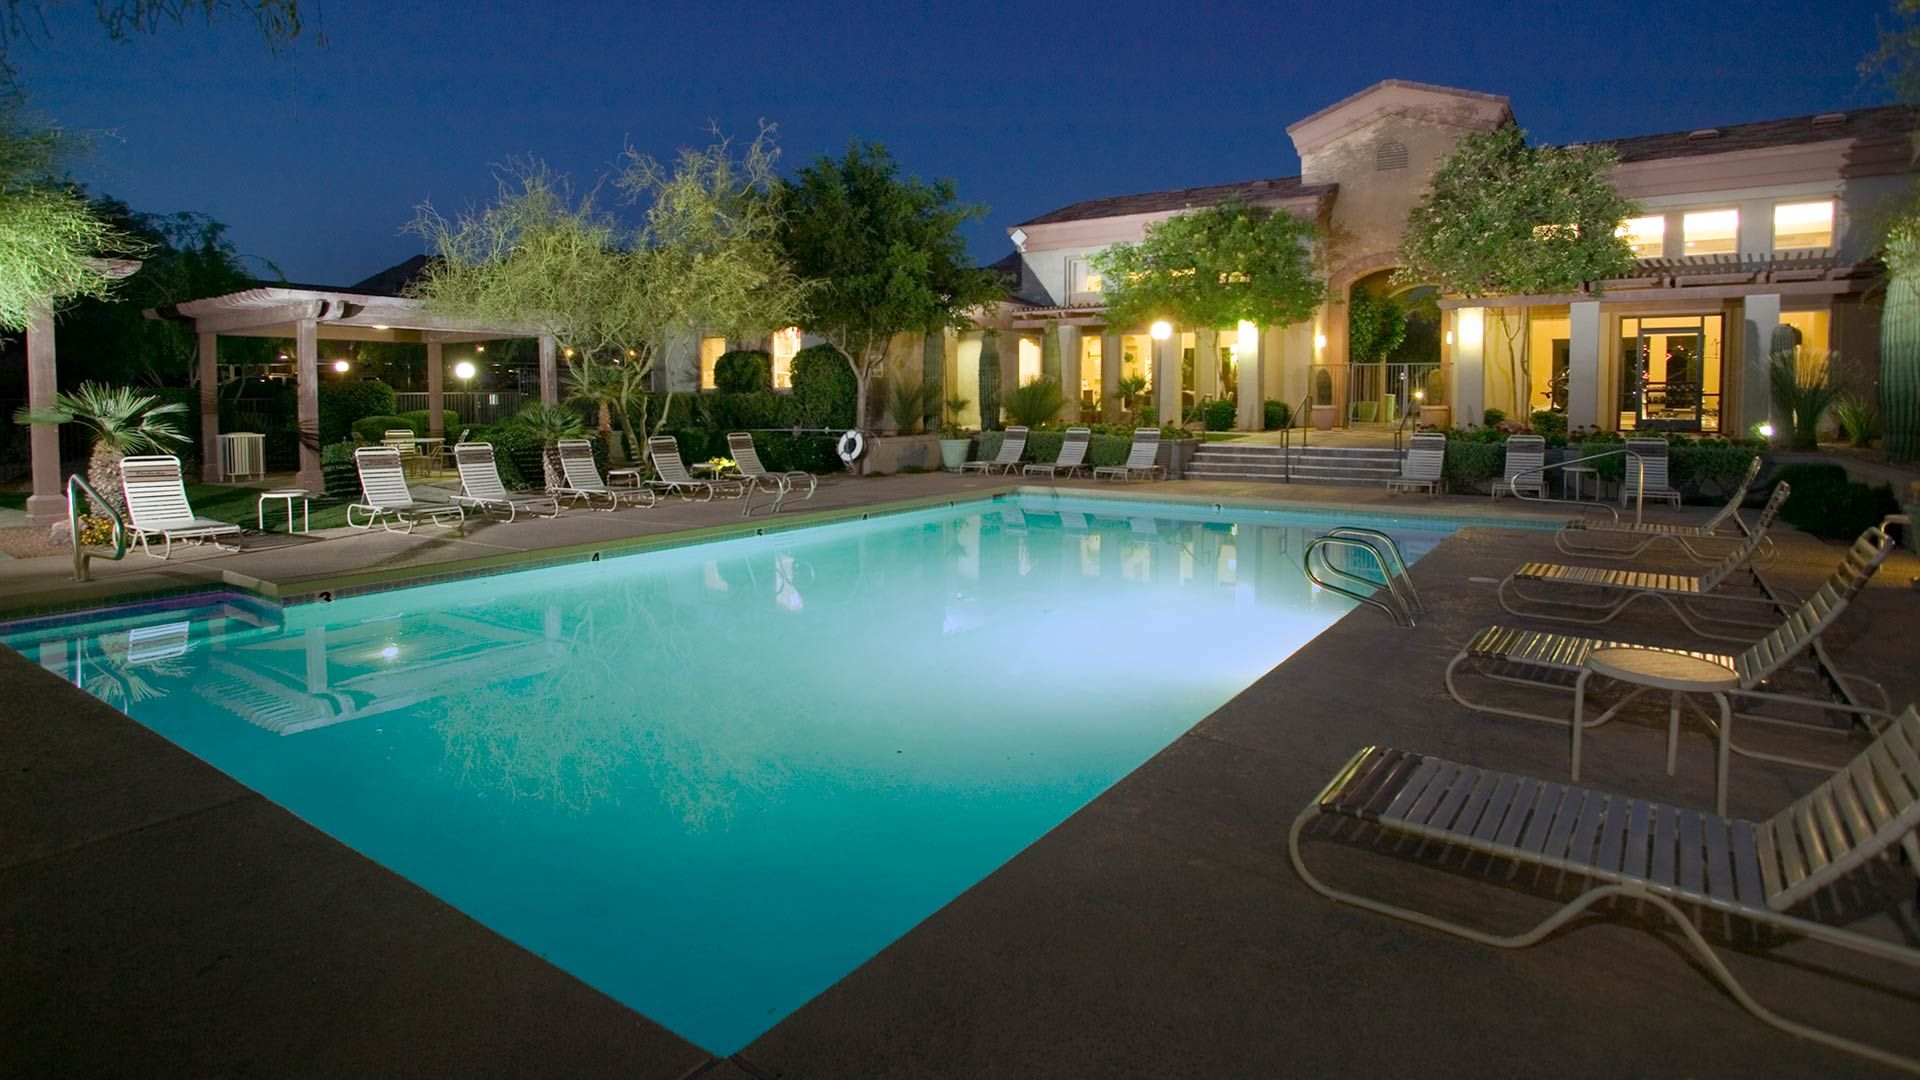 Mark Taylor Homes Dakota At Mcdowell Mountain Ranch Apartments In Scottsdale Arizona Luxury Apartments Apartments For Rent Condos For Rent